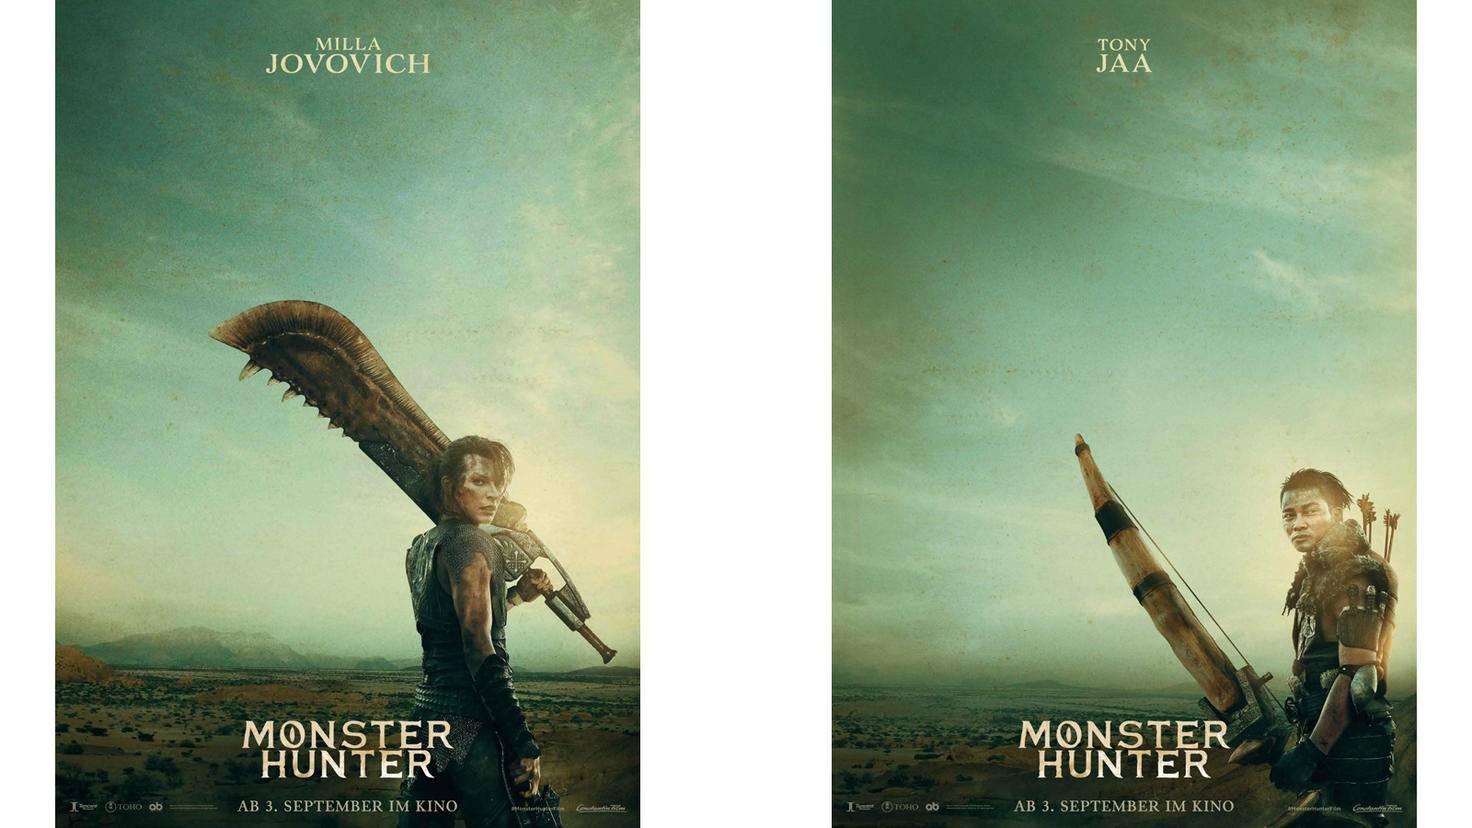 Monster Hunter Milla Jovovich Tony Jaa